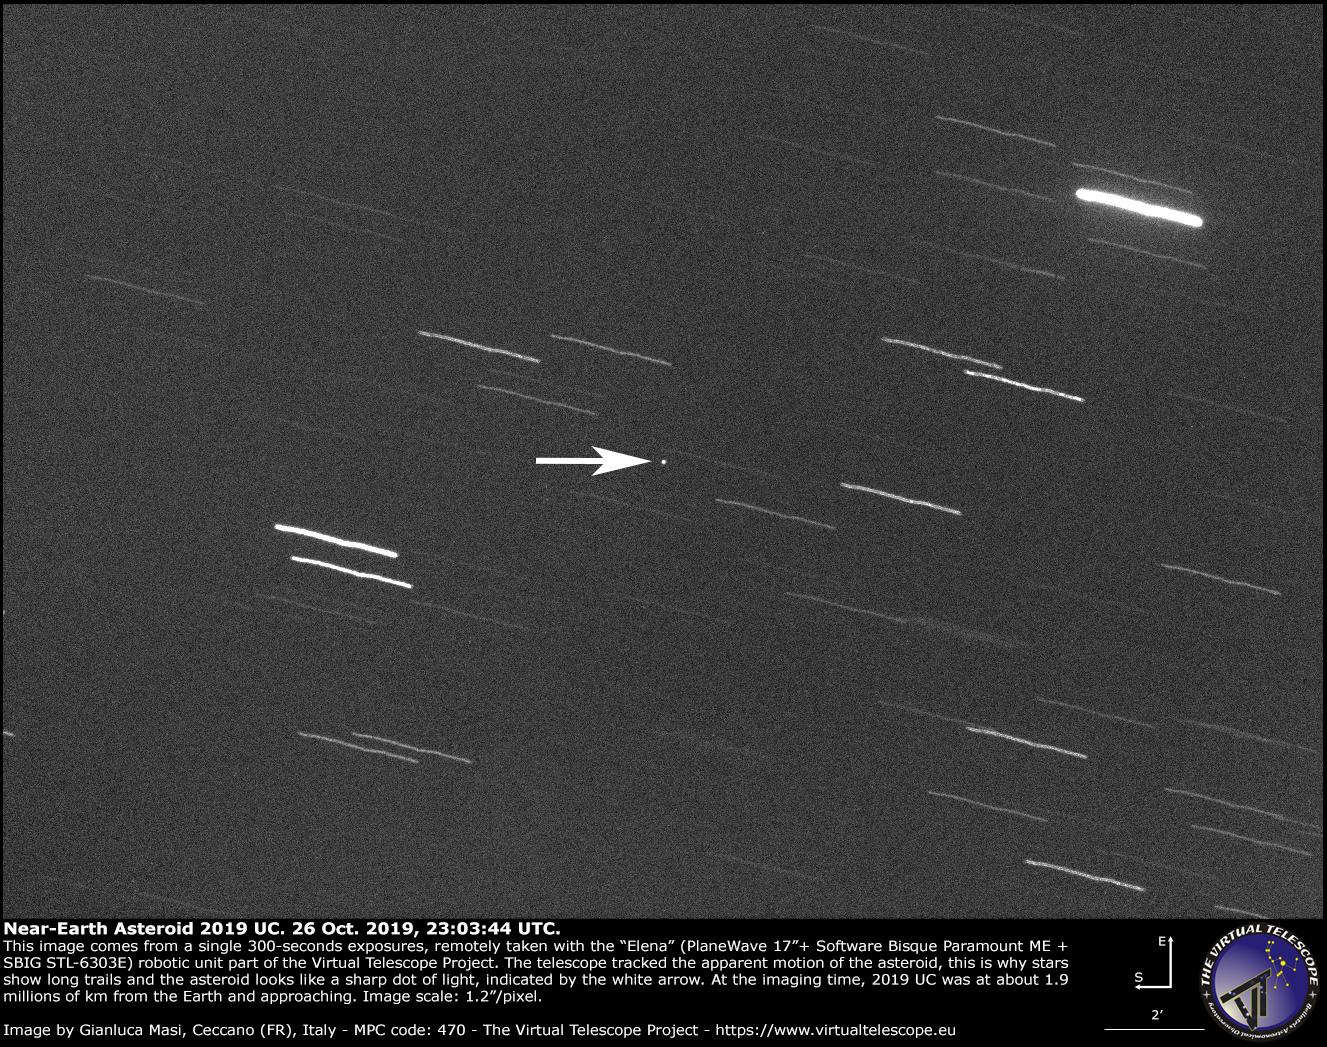 Near-Earth Asteroid 2019 UC: 26 Oct. 2019